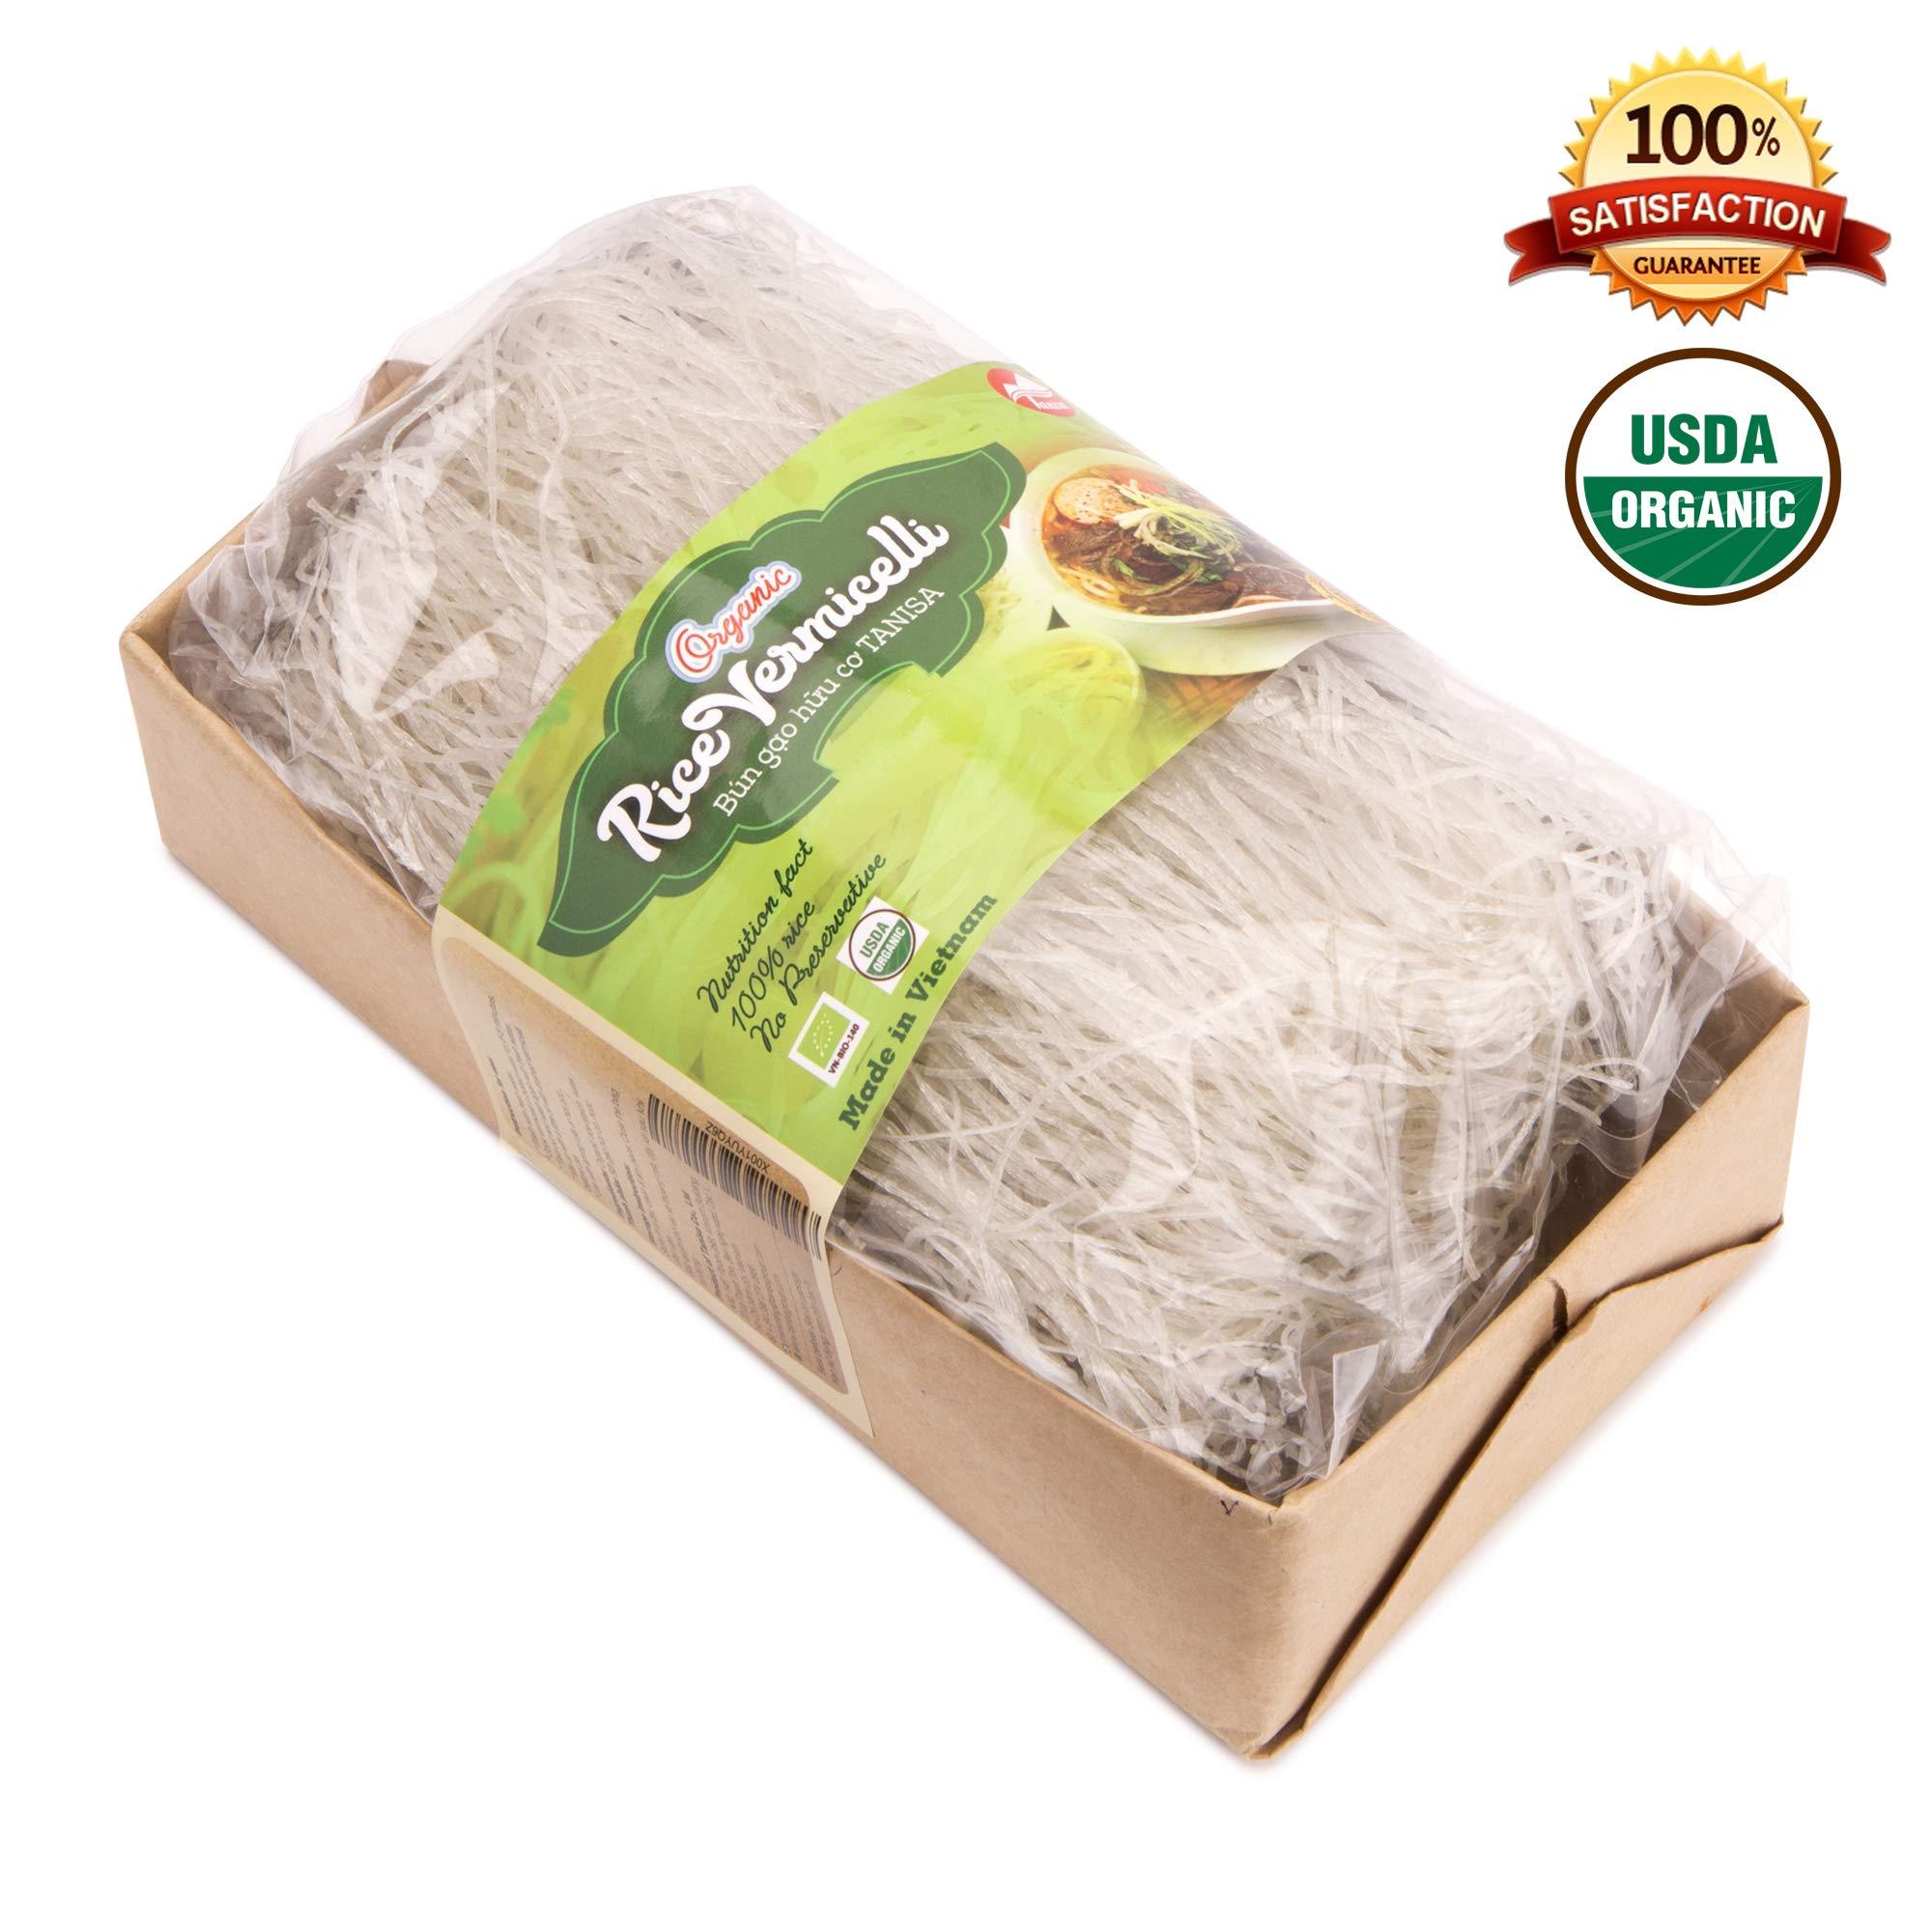 Amazon.com : Tanisa Organic Spring Roll Rice Paper Wrapper